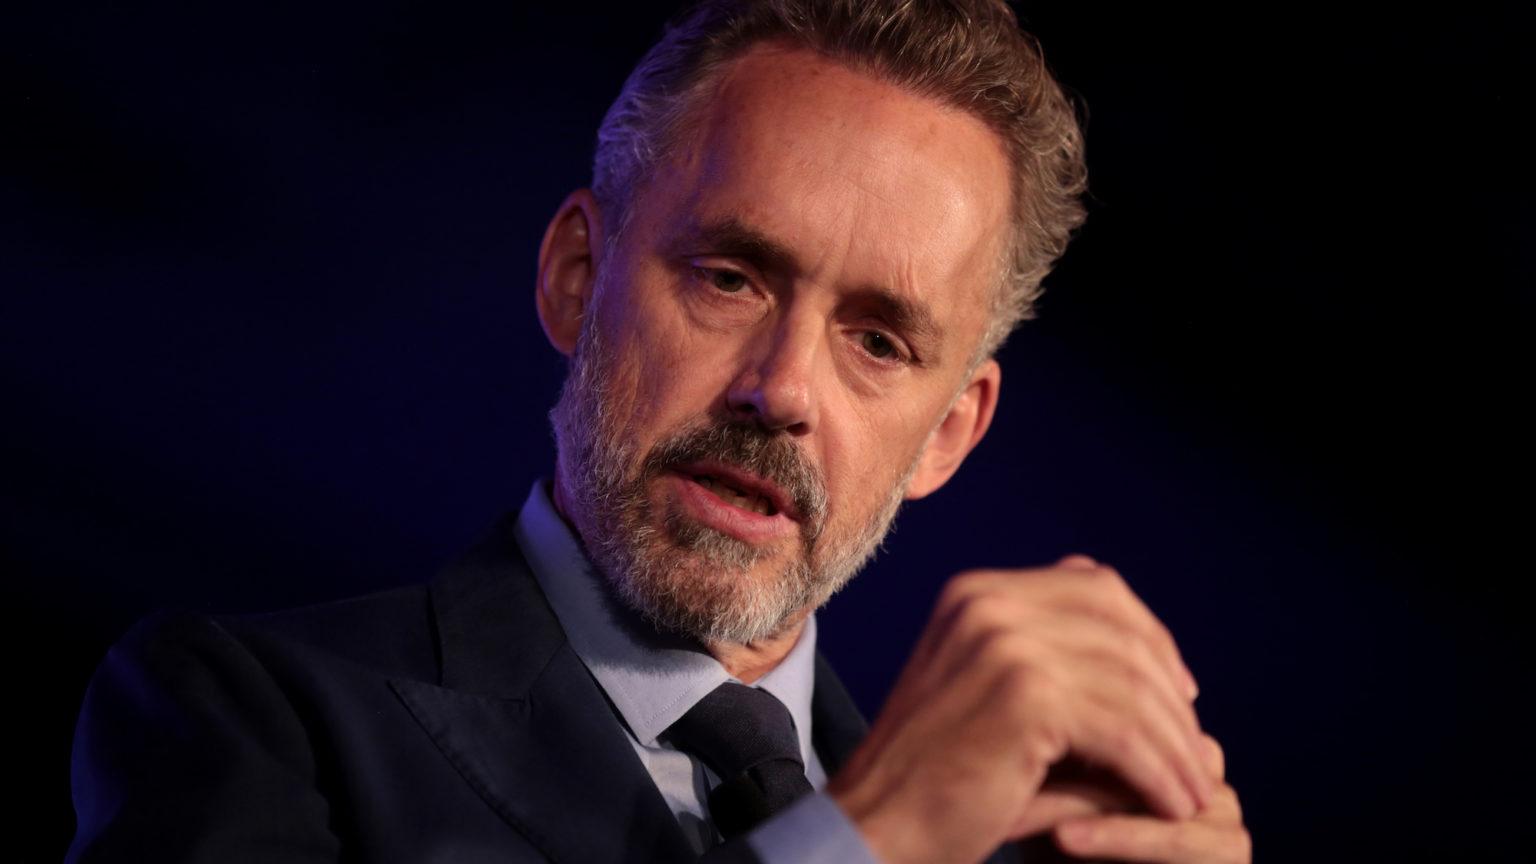 Jordan Peterson: how the left manufactured a folk devil